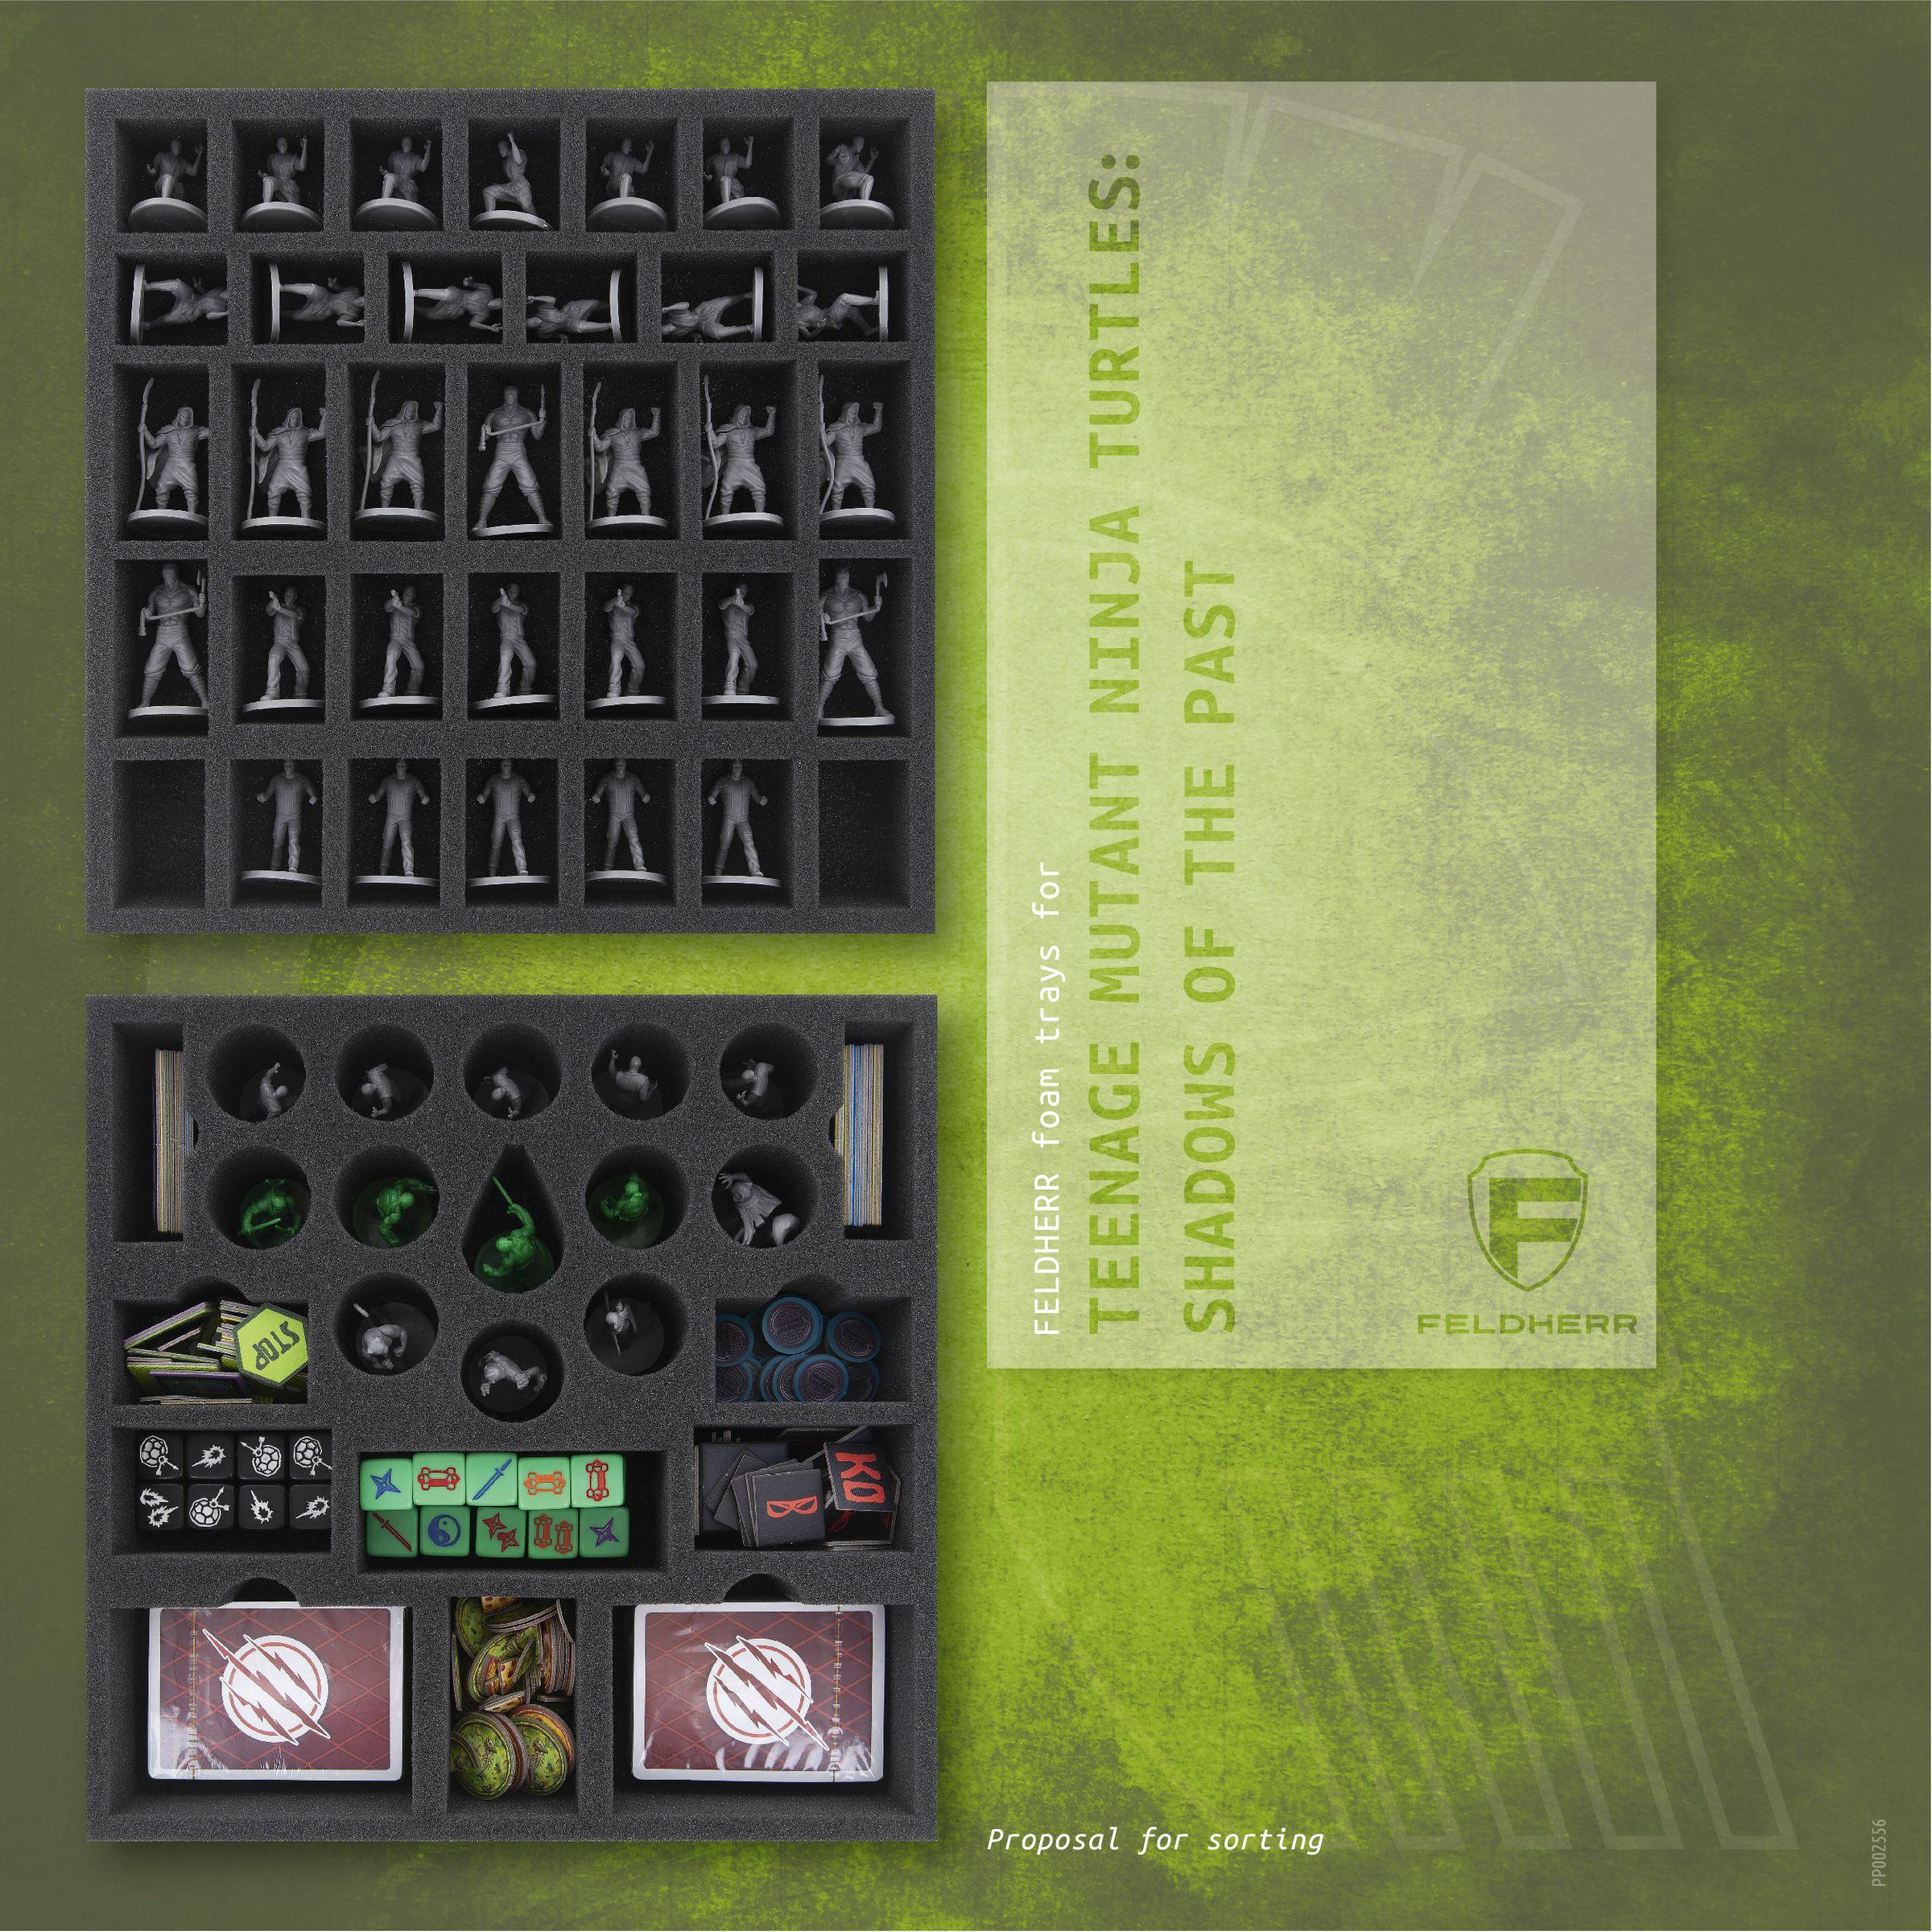 PP002556 - Flyer for Teenage Mutant Ninja Turtles: Shadows of the Past